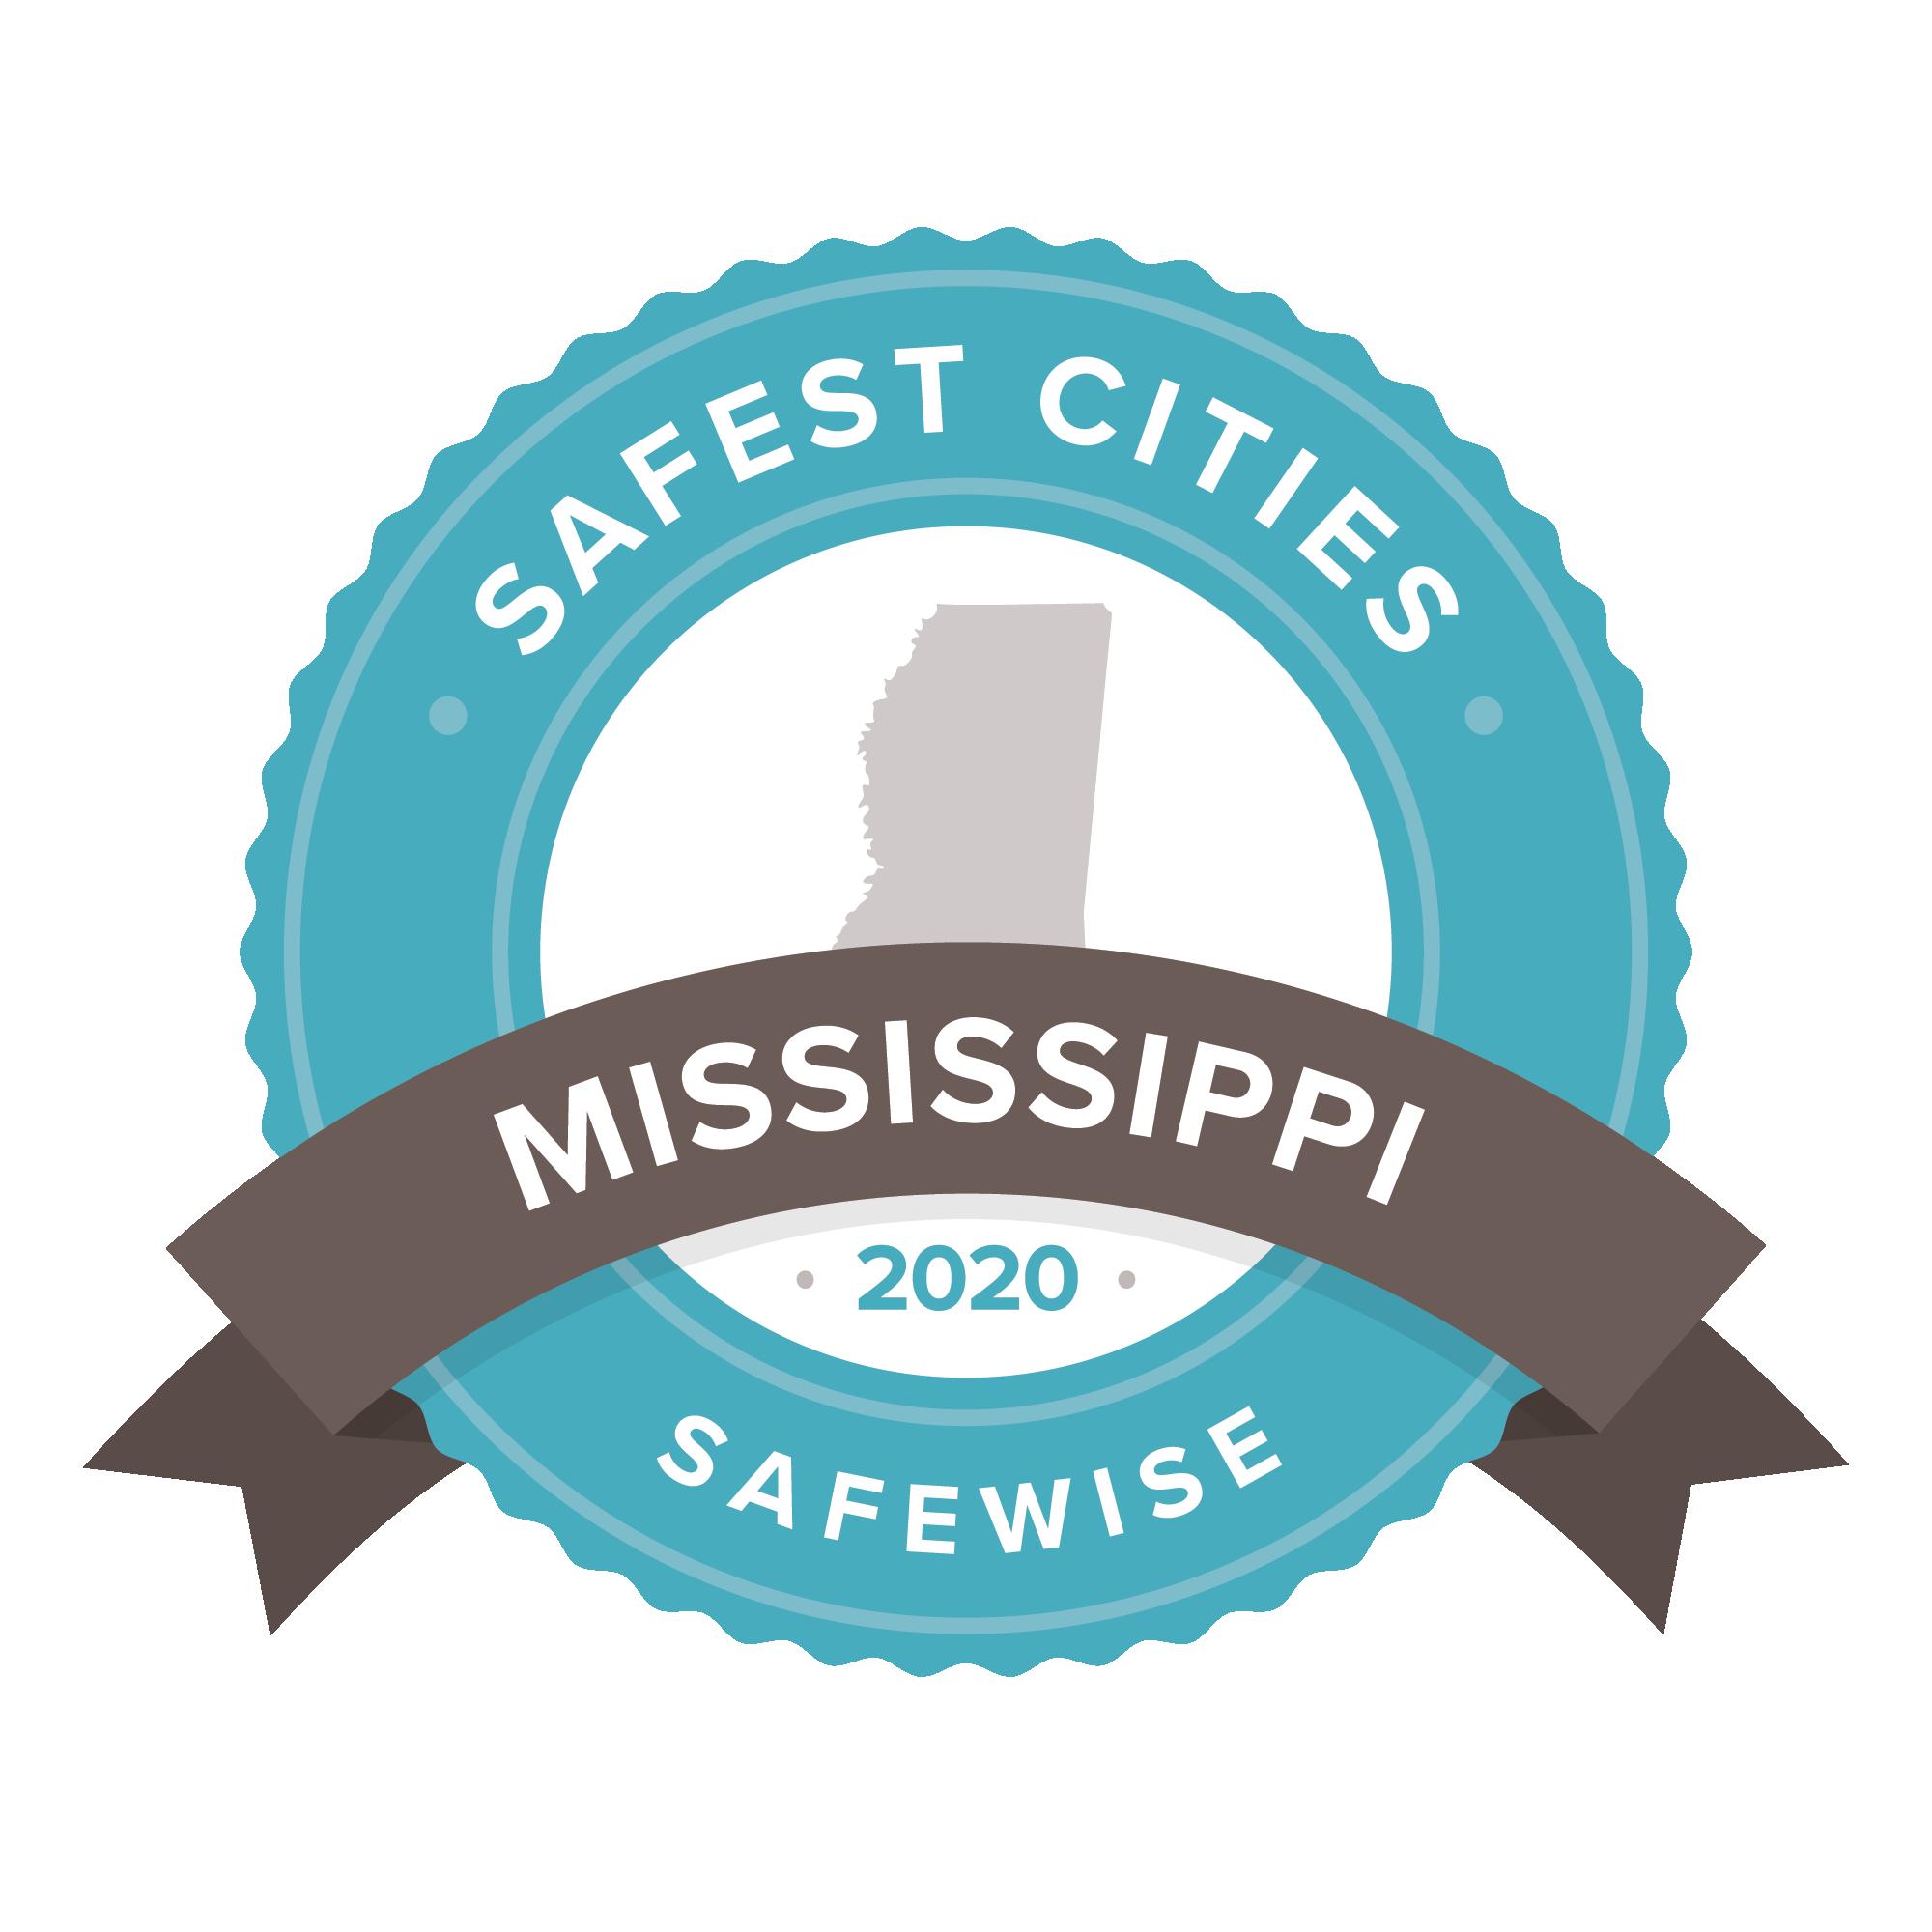 Mississipi safest cities badge